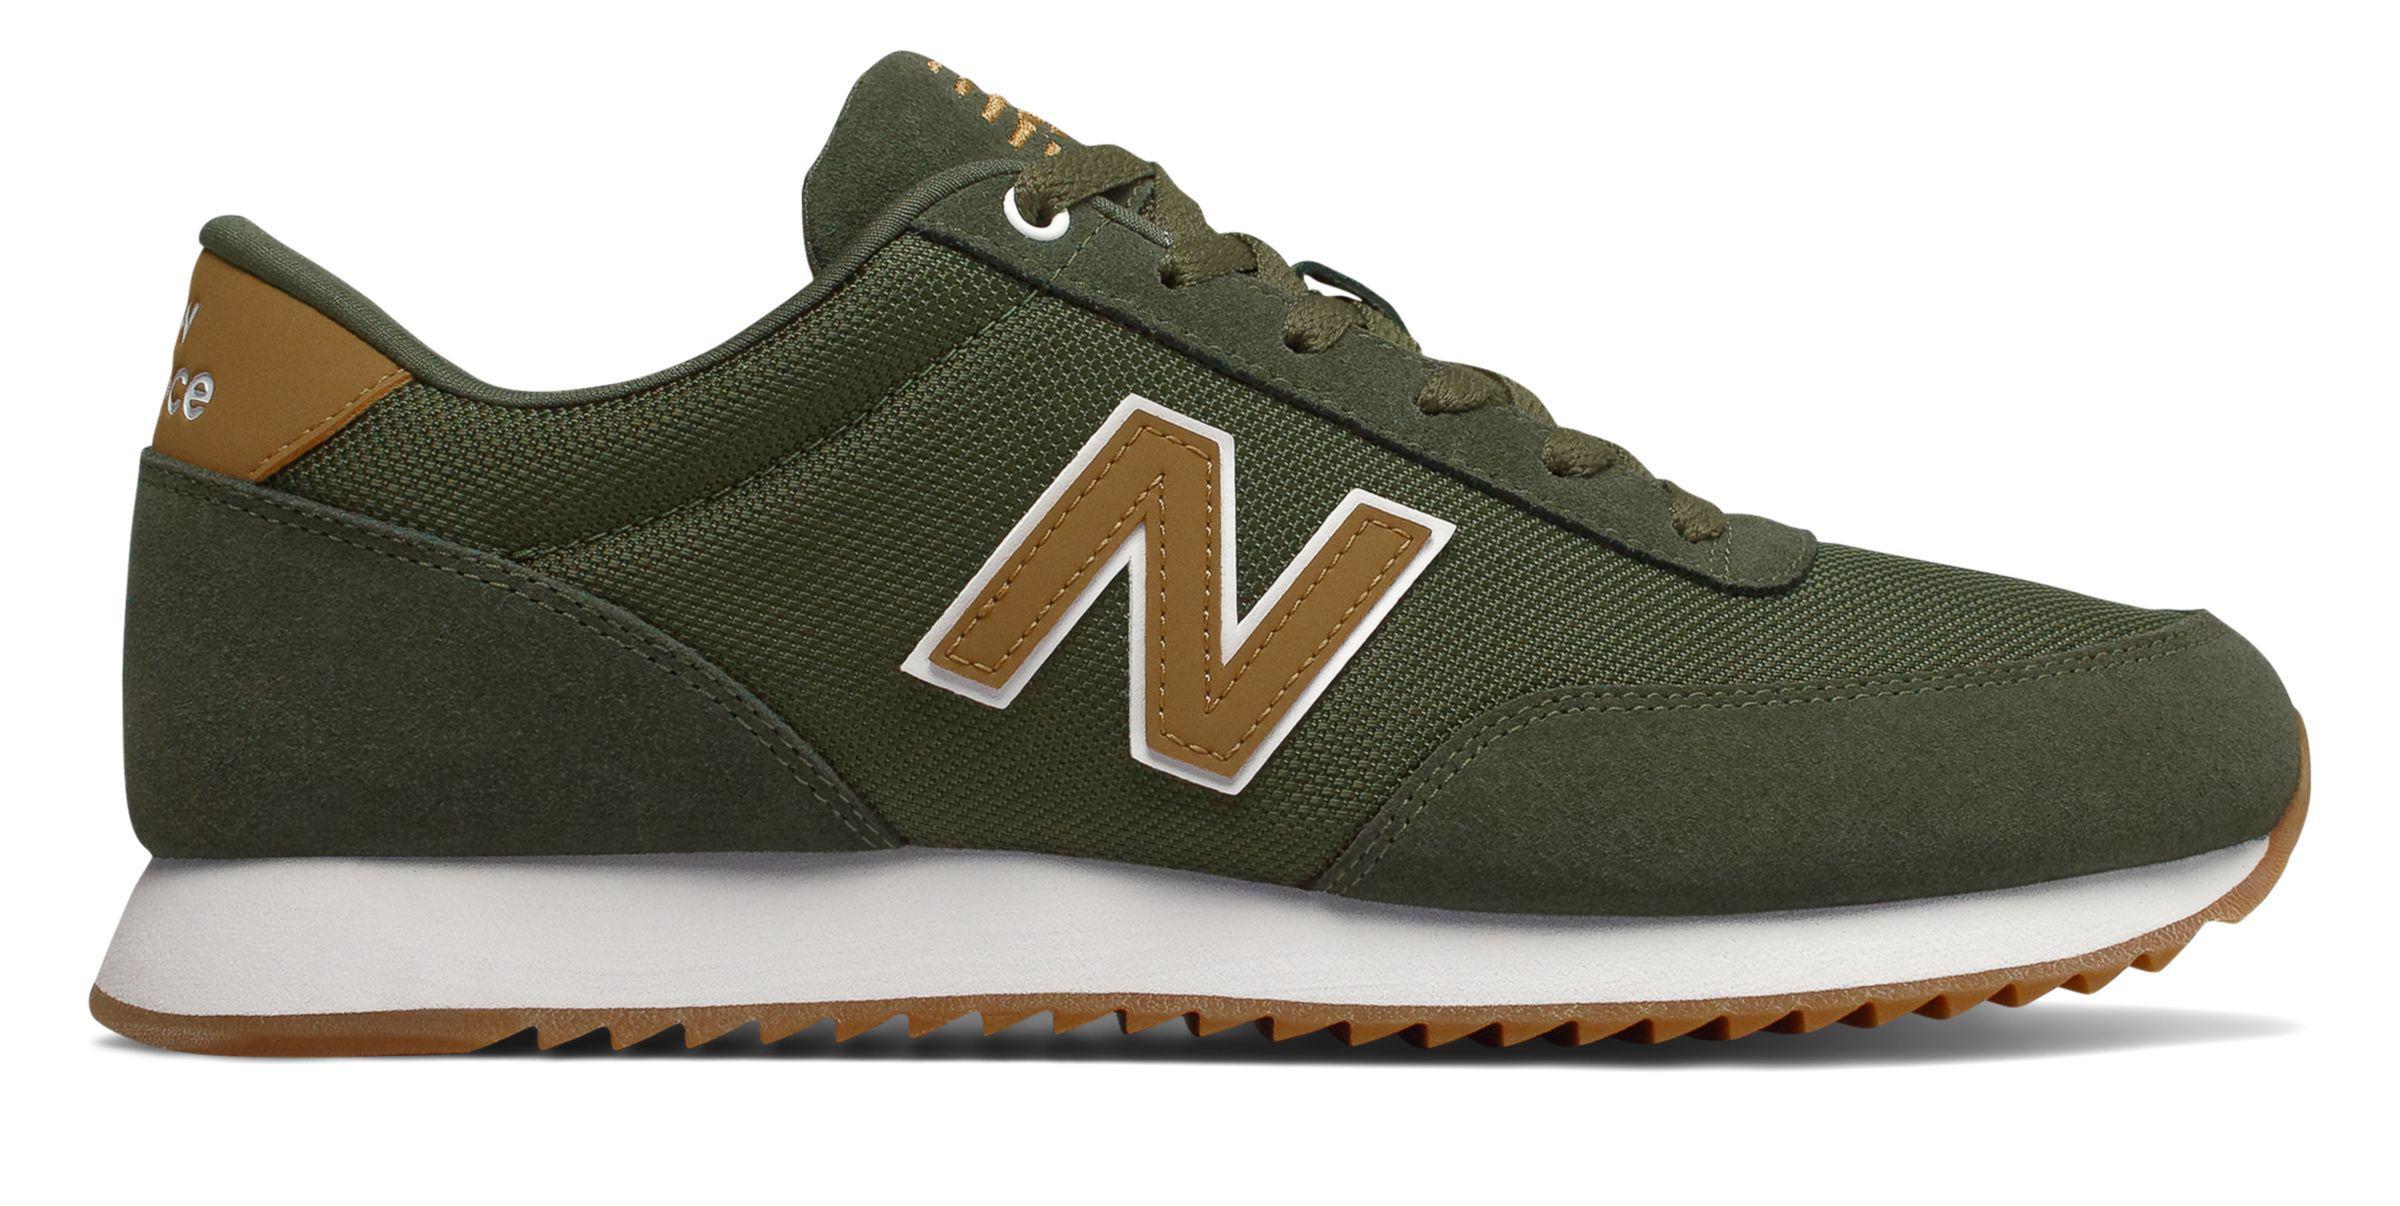 New Balance Rubber 501 Sneaker in Green for Men - Lyst